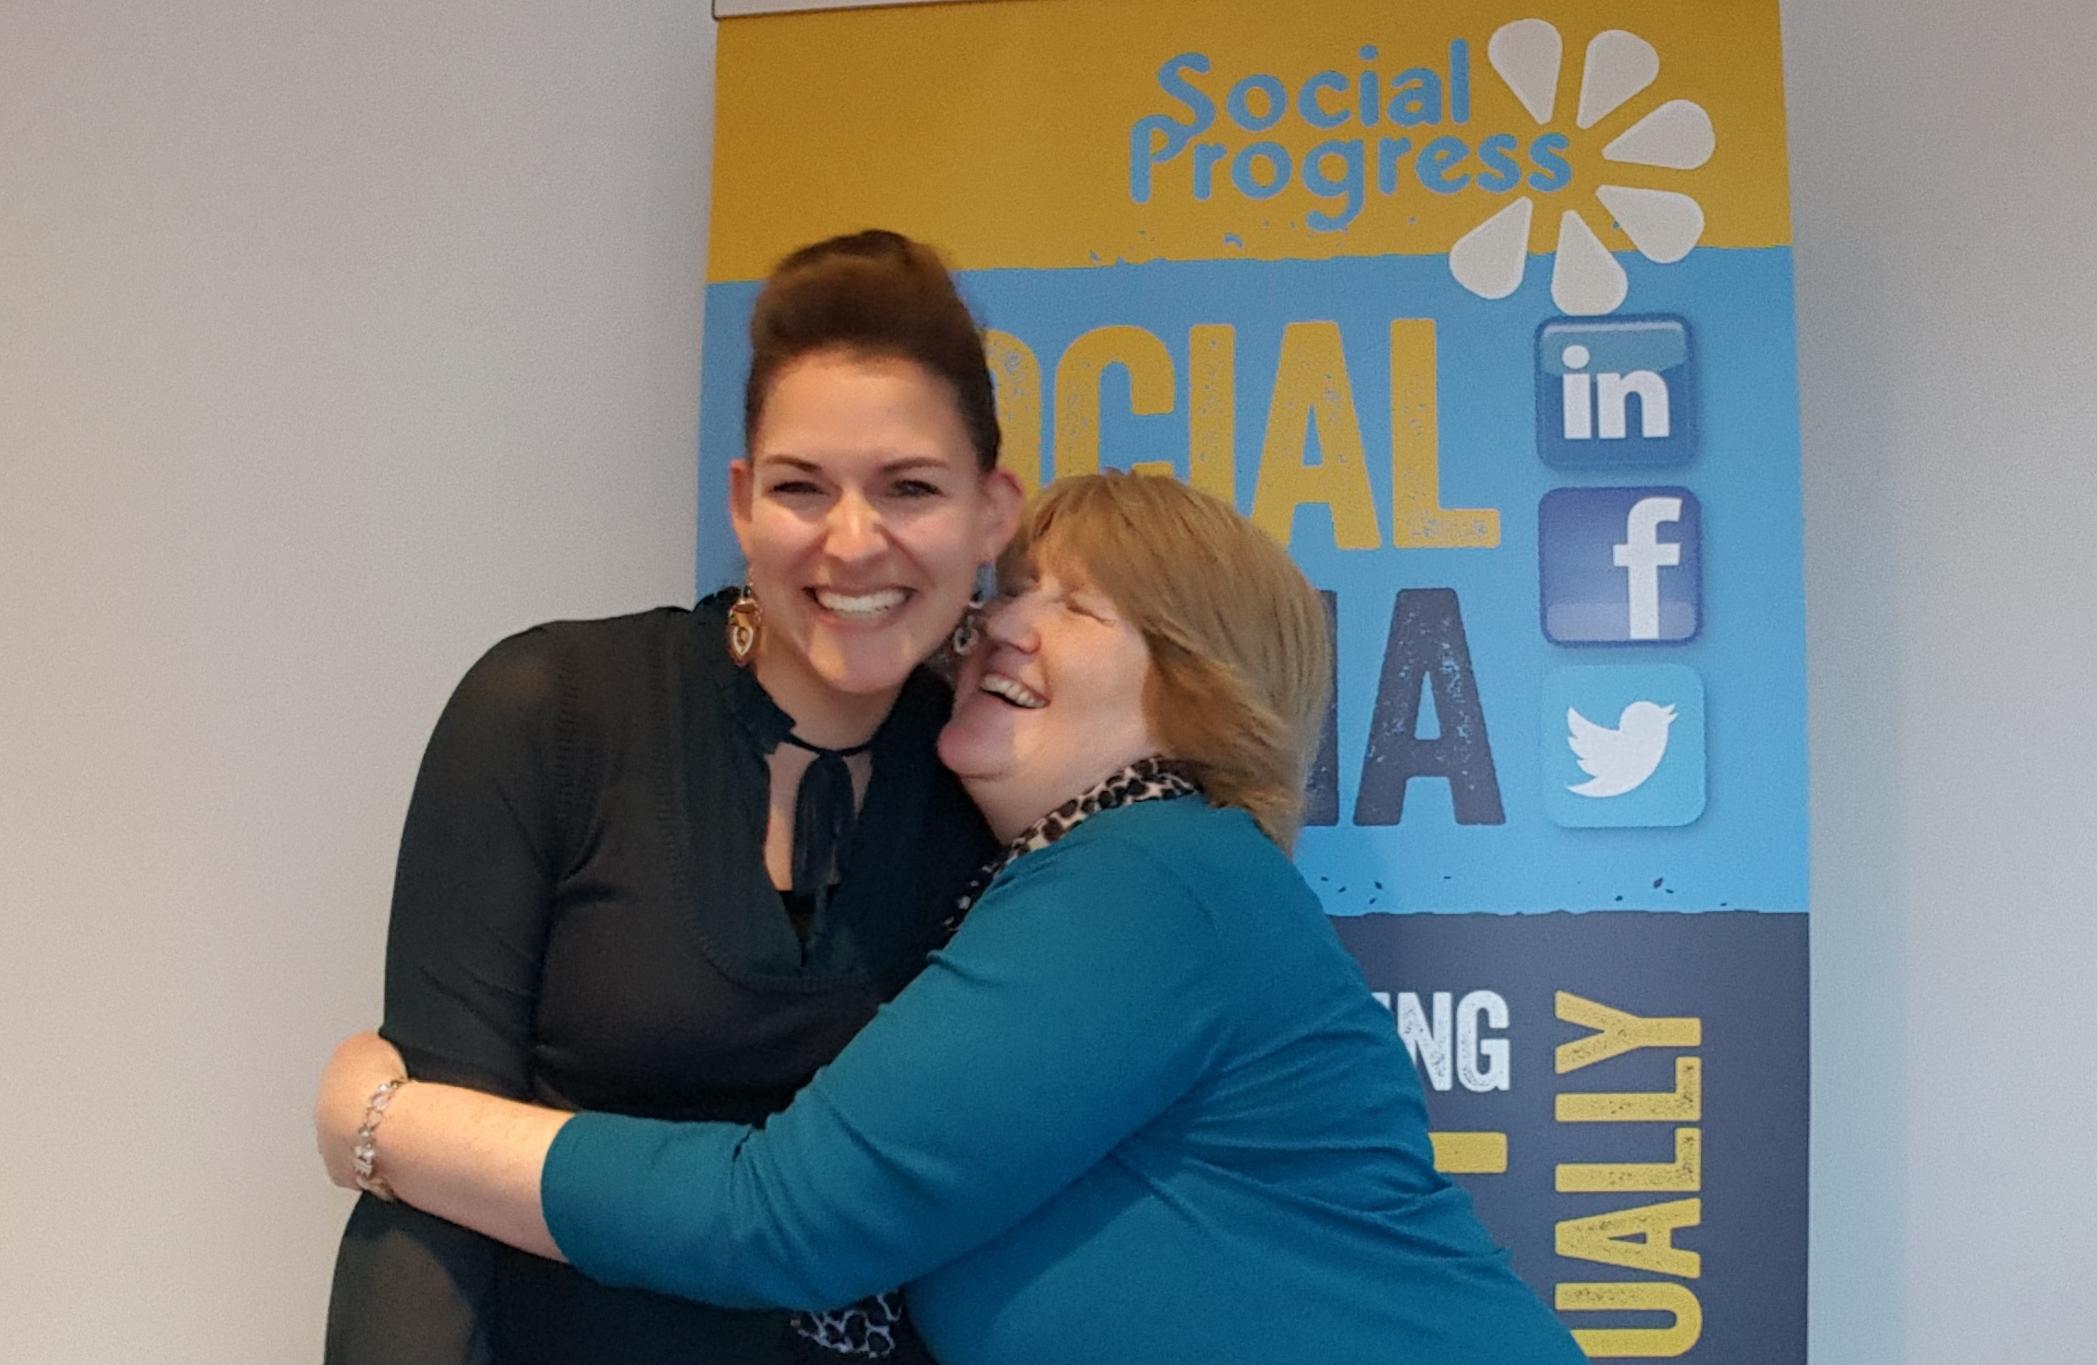 Social Progress - Digital Safety on Holiday